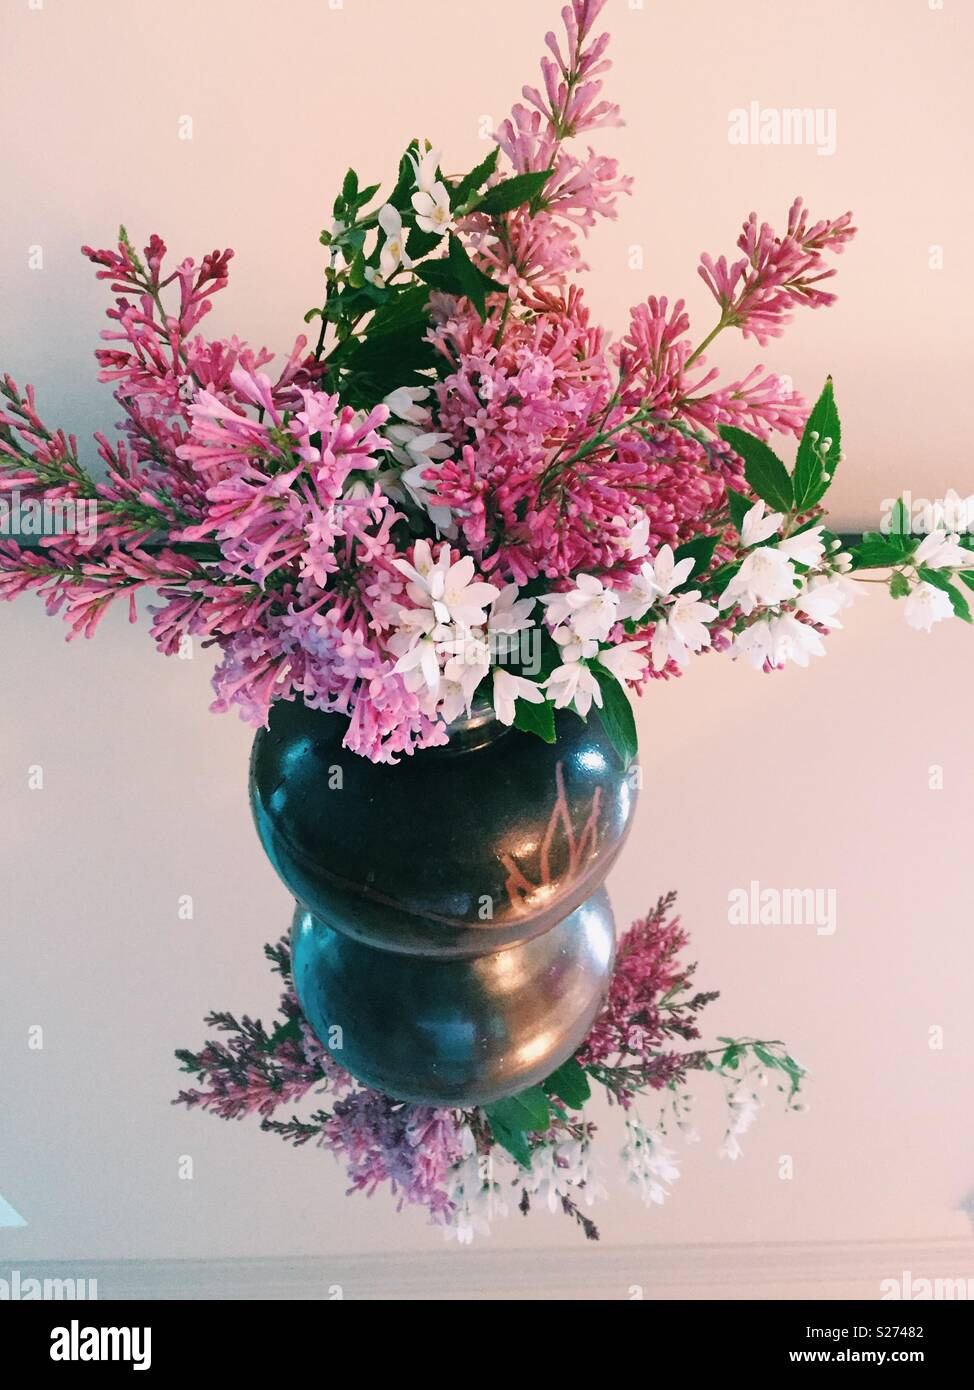 Frühling Blumen in der Keramik Vase. Stockbild